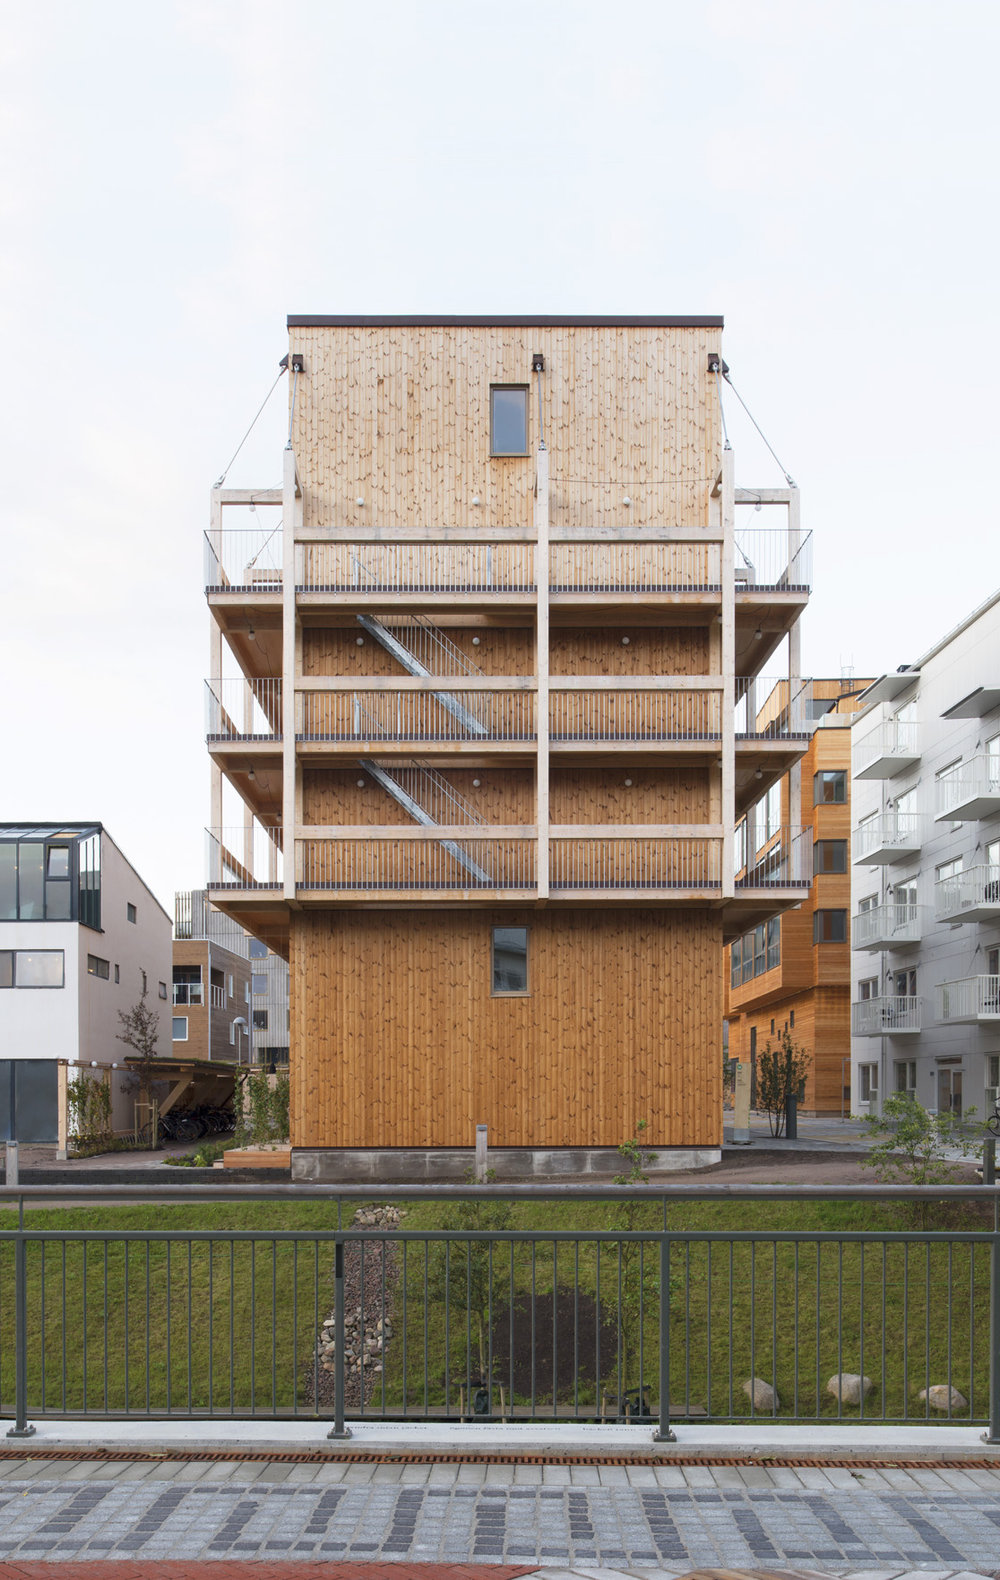 Traloftet-SPRIDD-©MikaelOlsson3862b-2_2.jpg